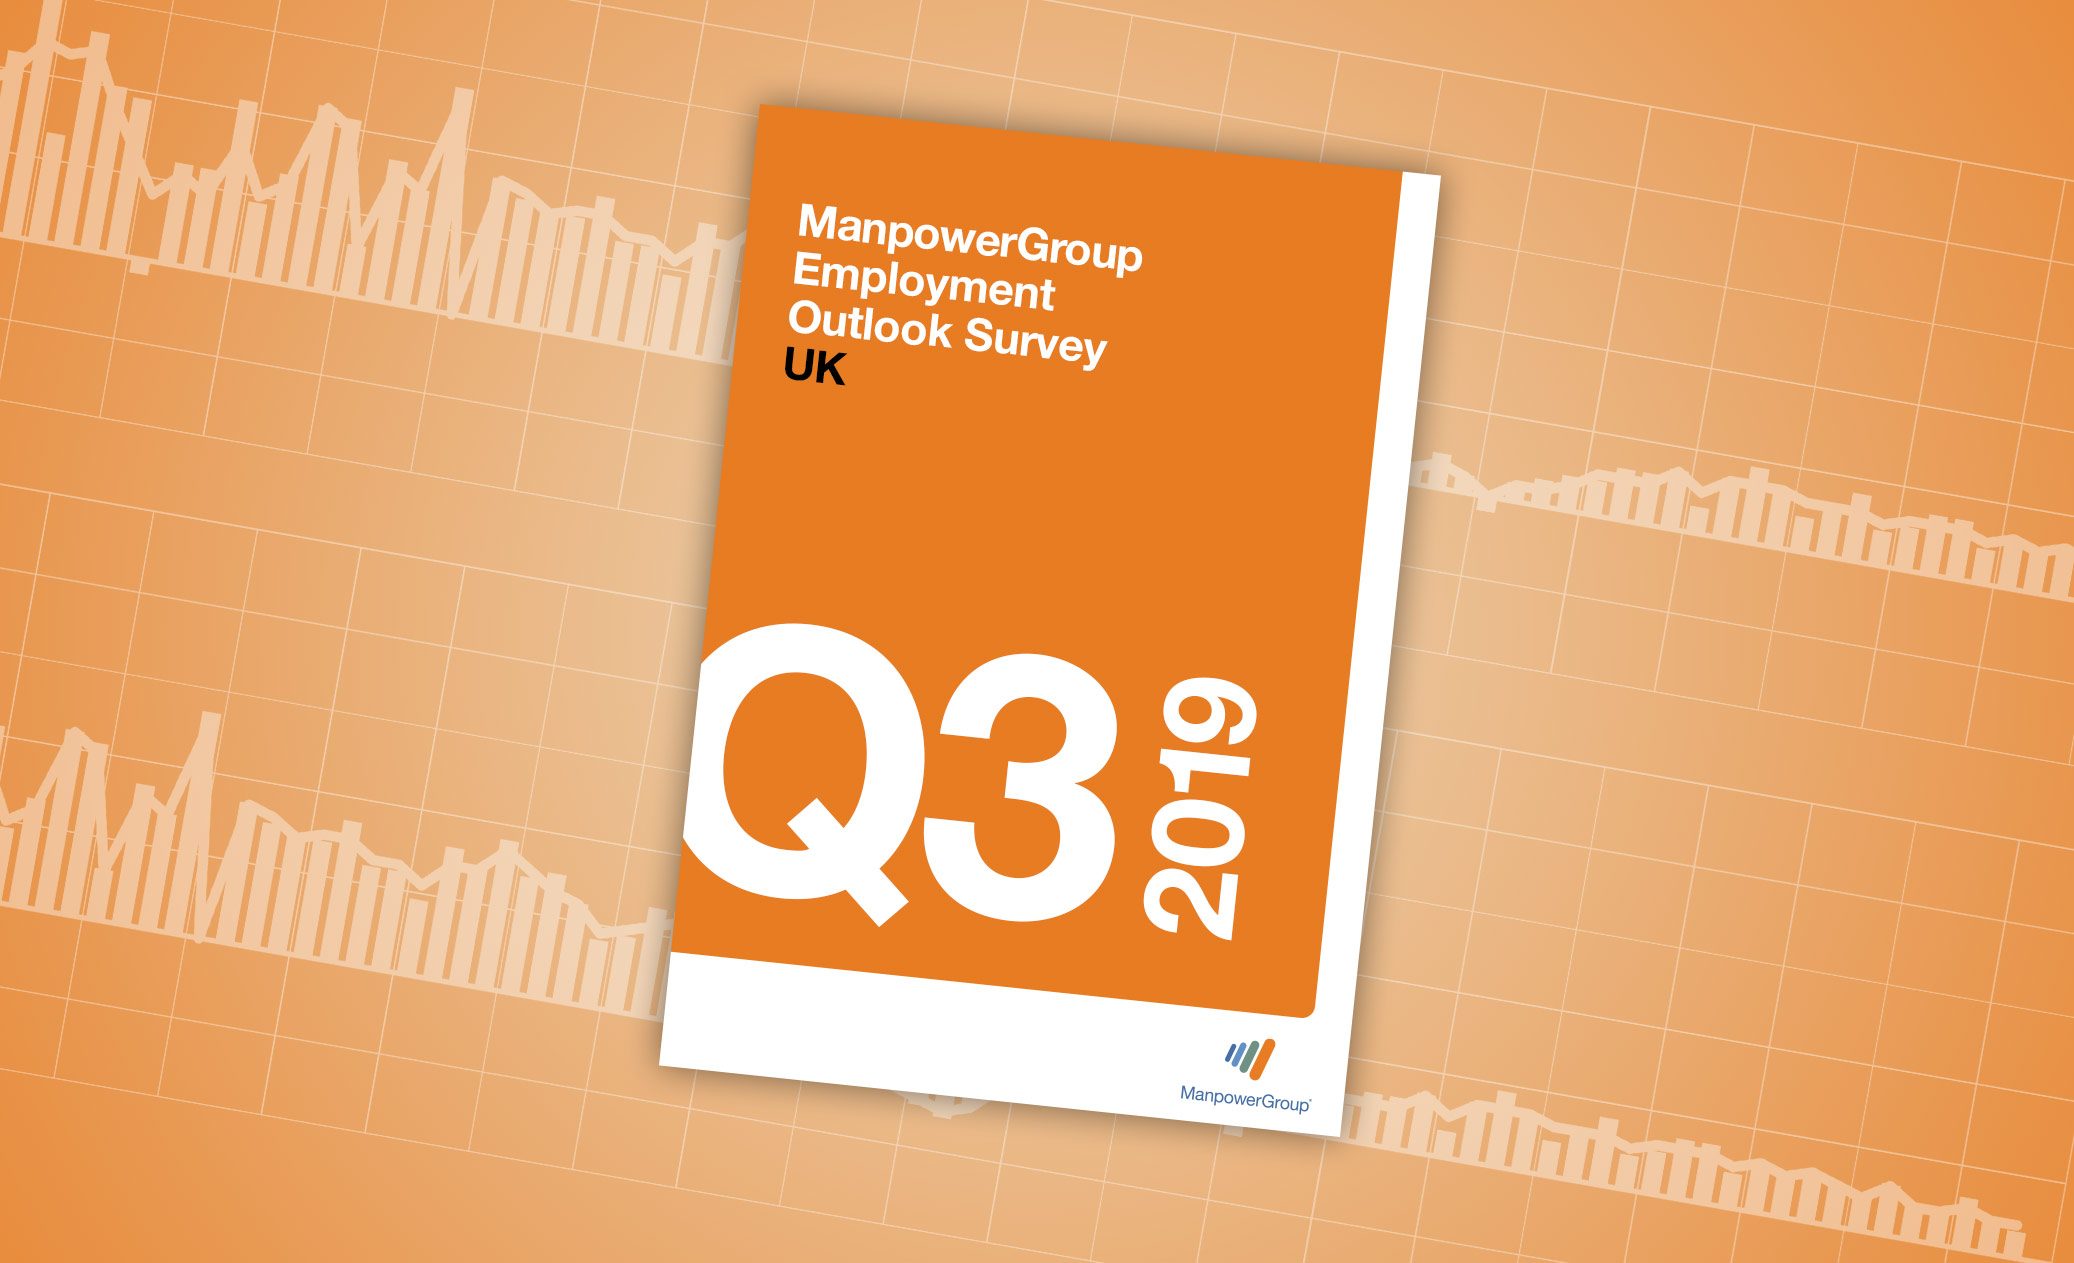 ManpowerGroup Employment Outlook Survey – Q3 2019